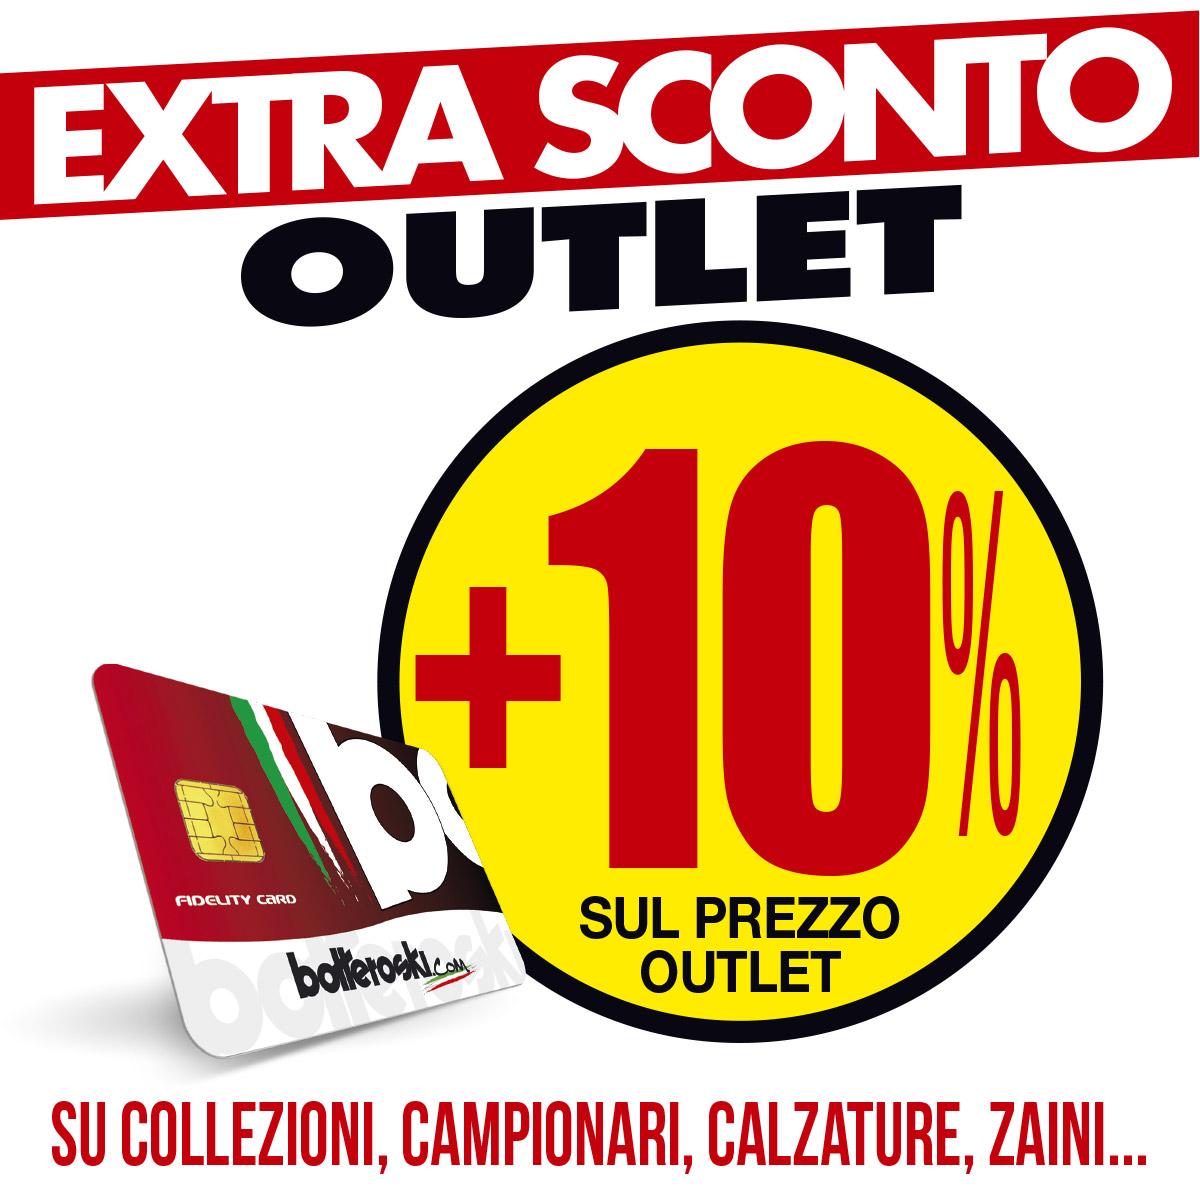 Promo-VERNANTE-CUNEO_EXTRASCONTOBOCARD-10%_BannerNewsletter